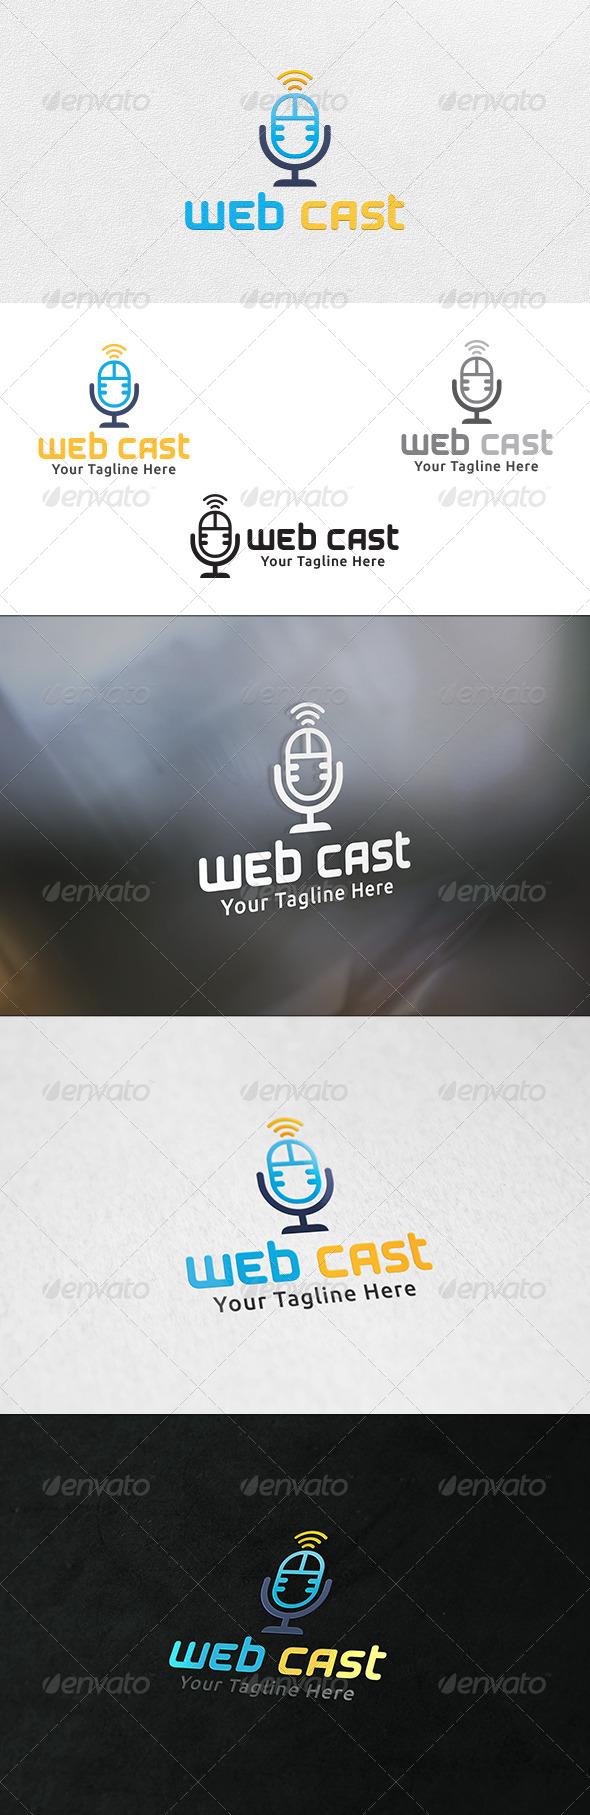 GraphicRiver Web Cast Logo Template 6503236